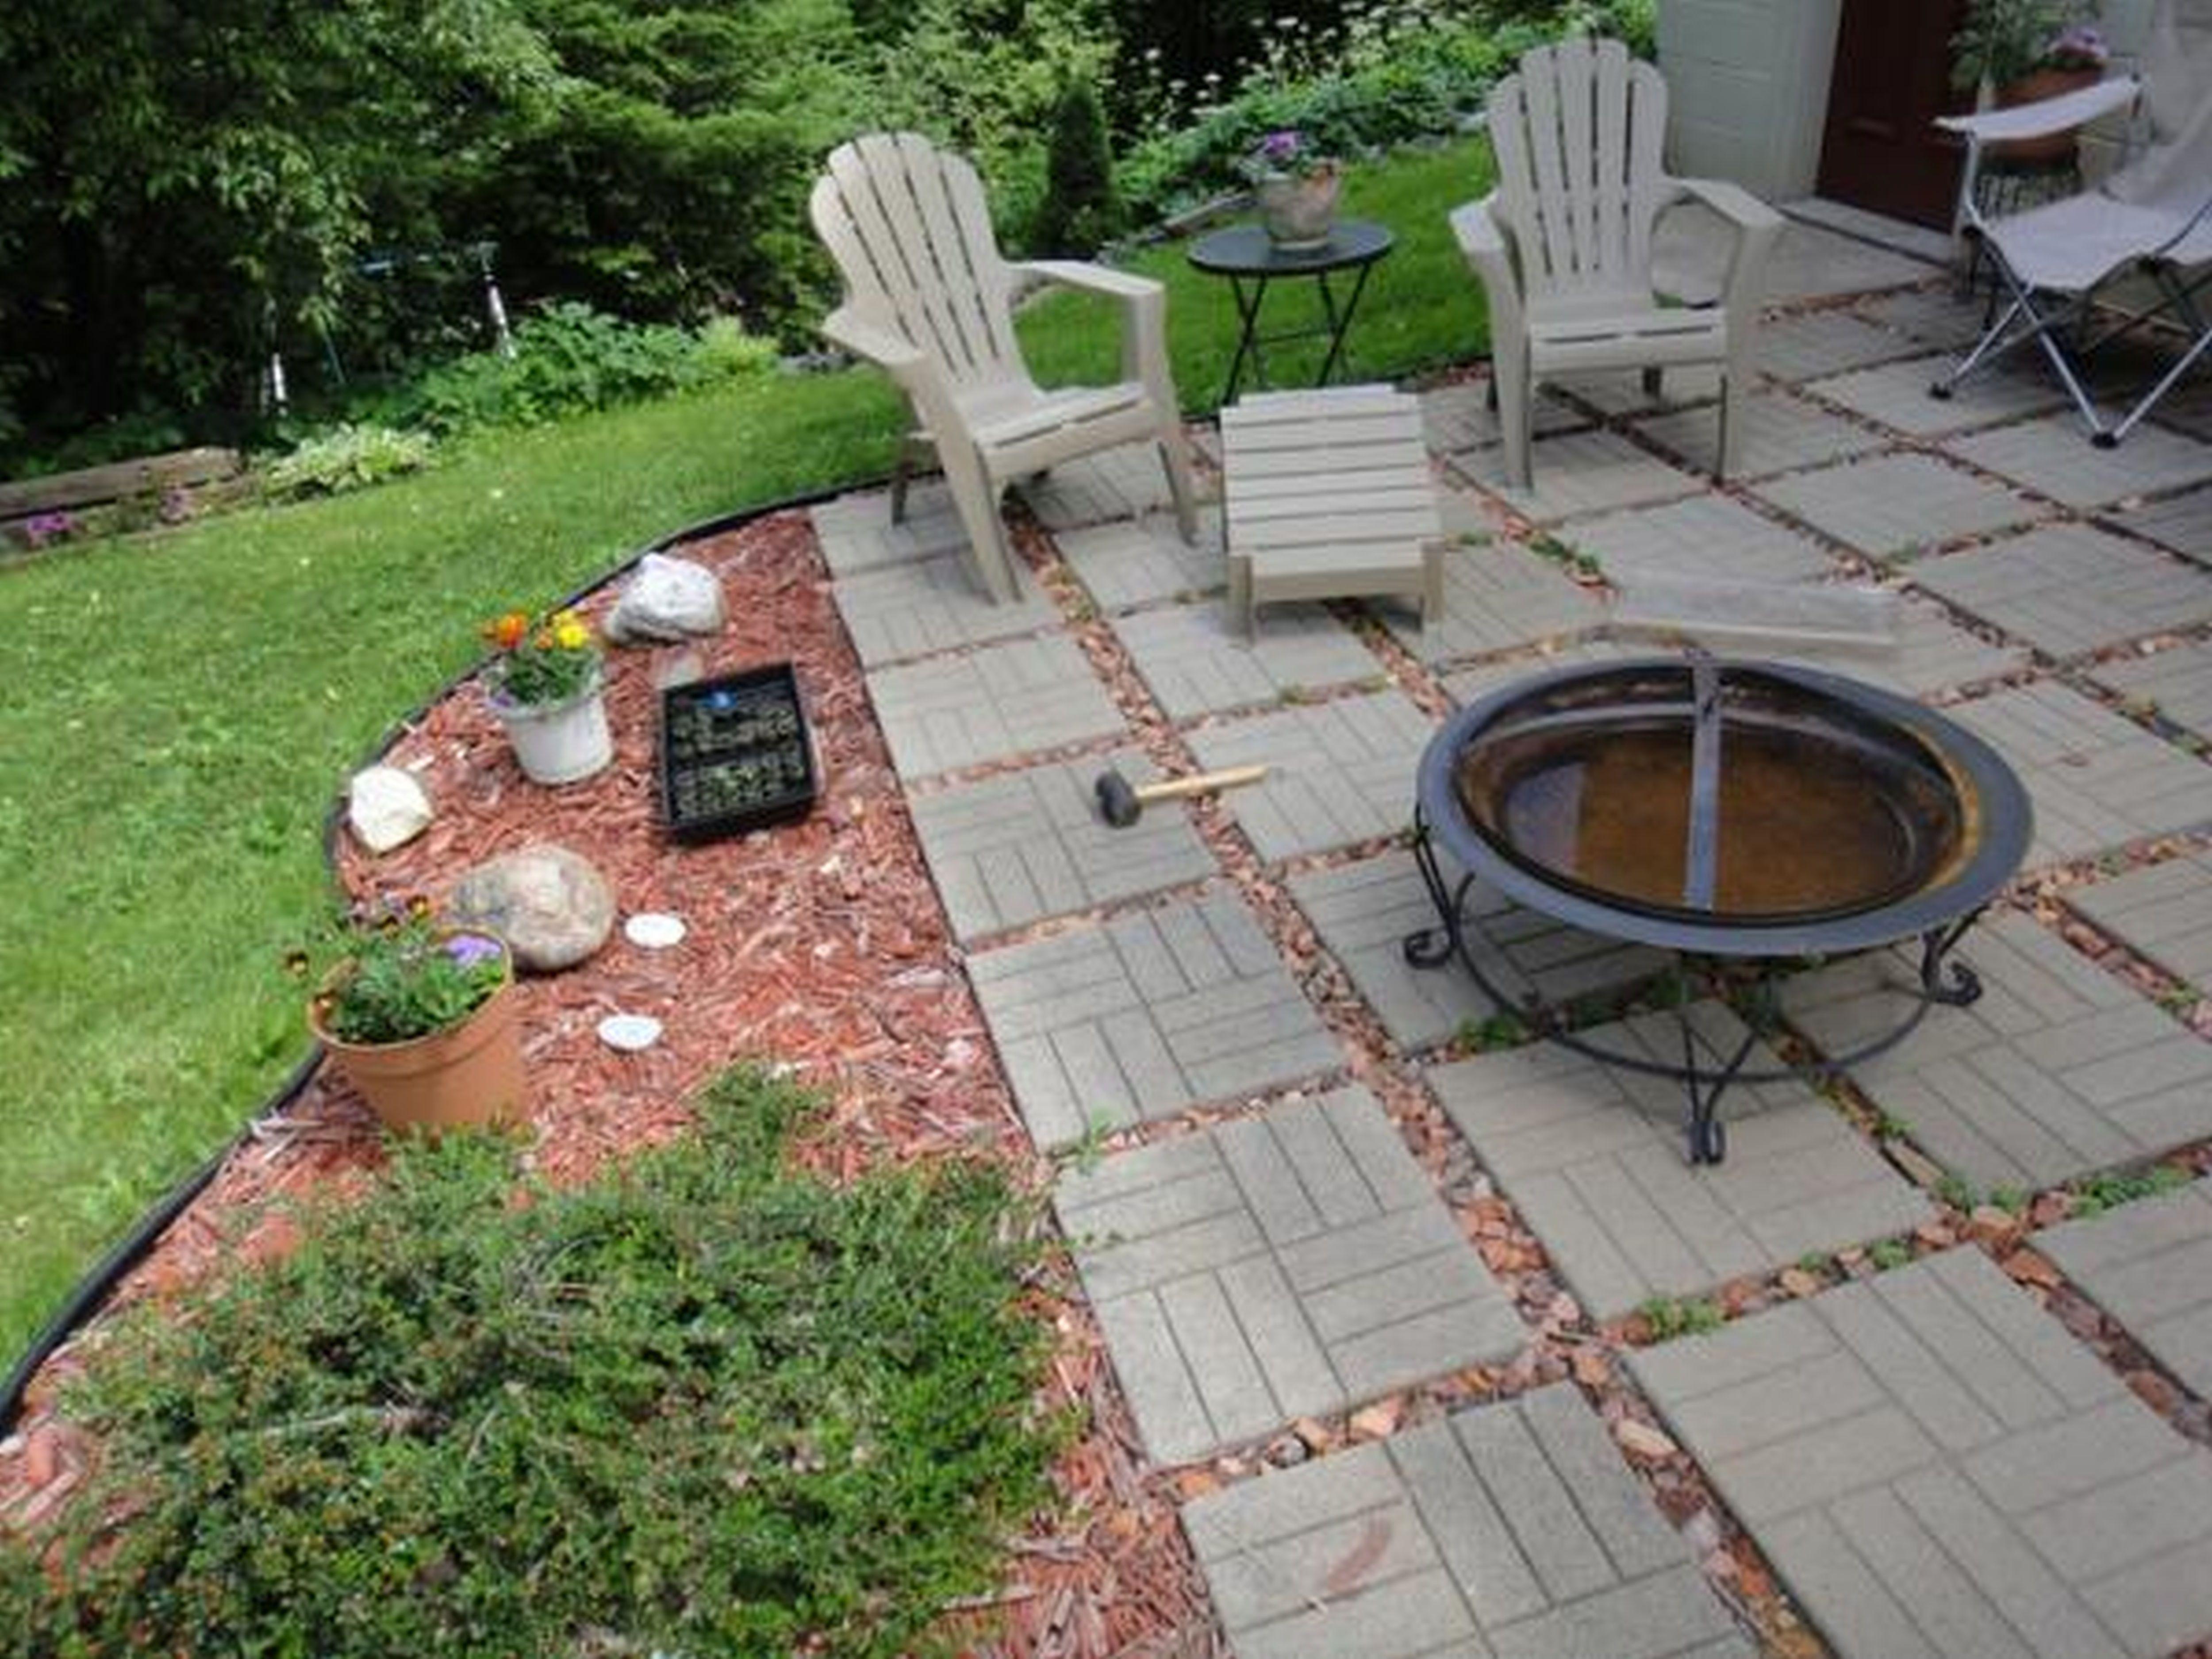 patio landscaping ideas on a budget simple backyard designs cheap rh pinterest com